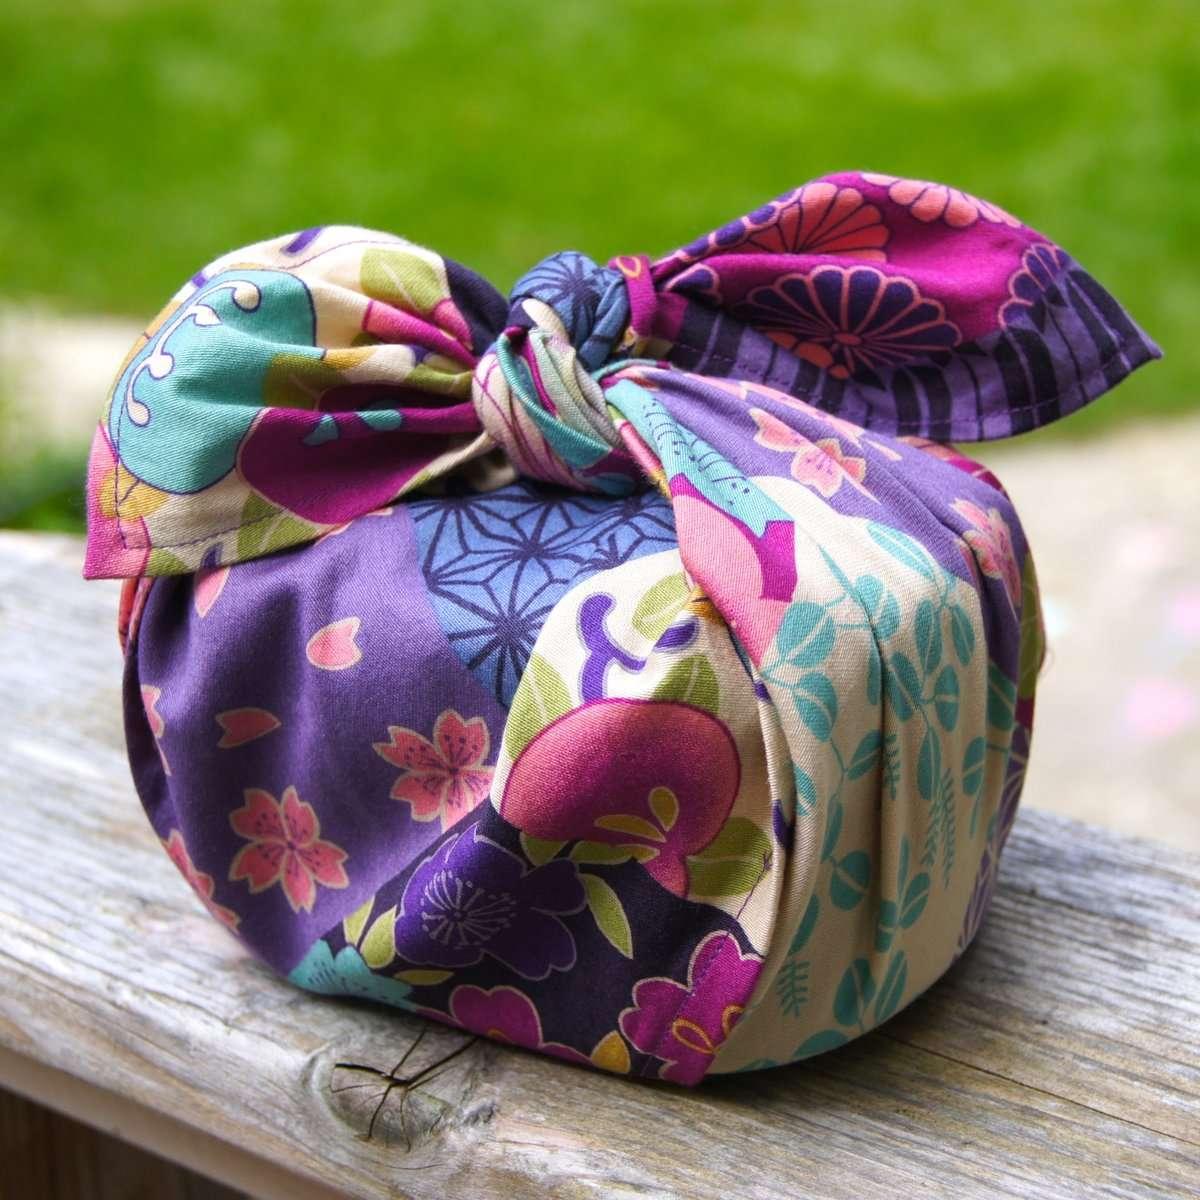 Diferentes maneras de envolver regalos con Furoshiki 7